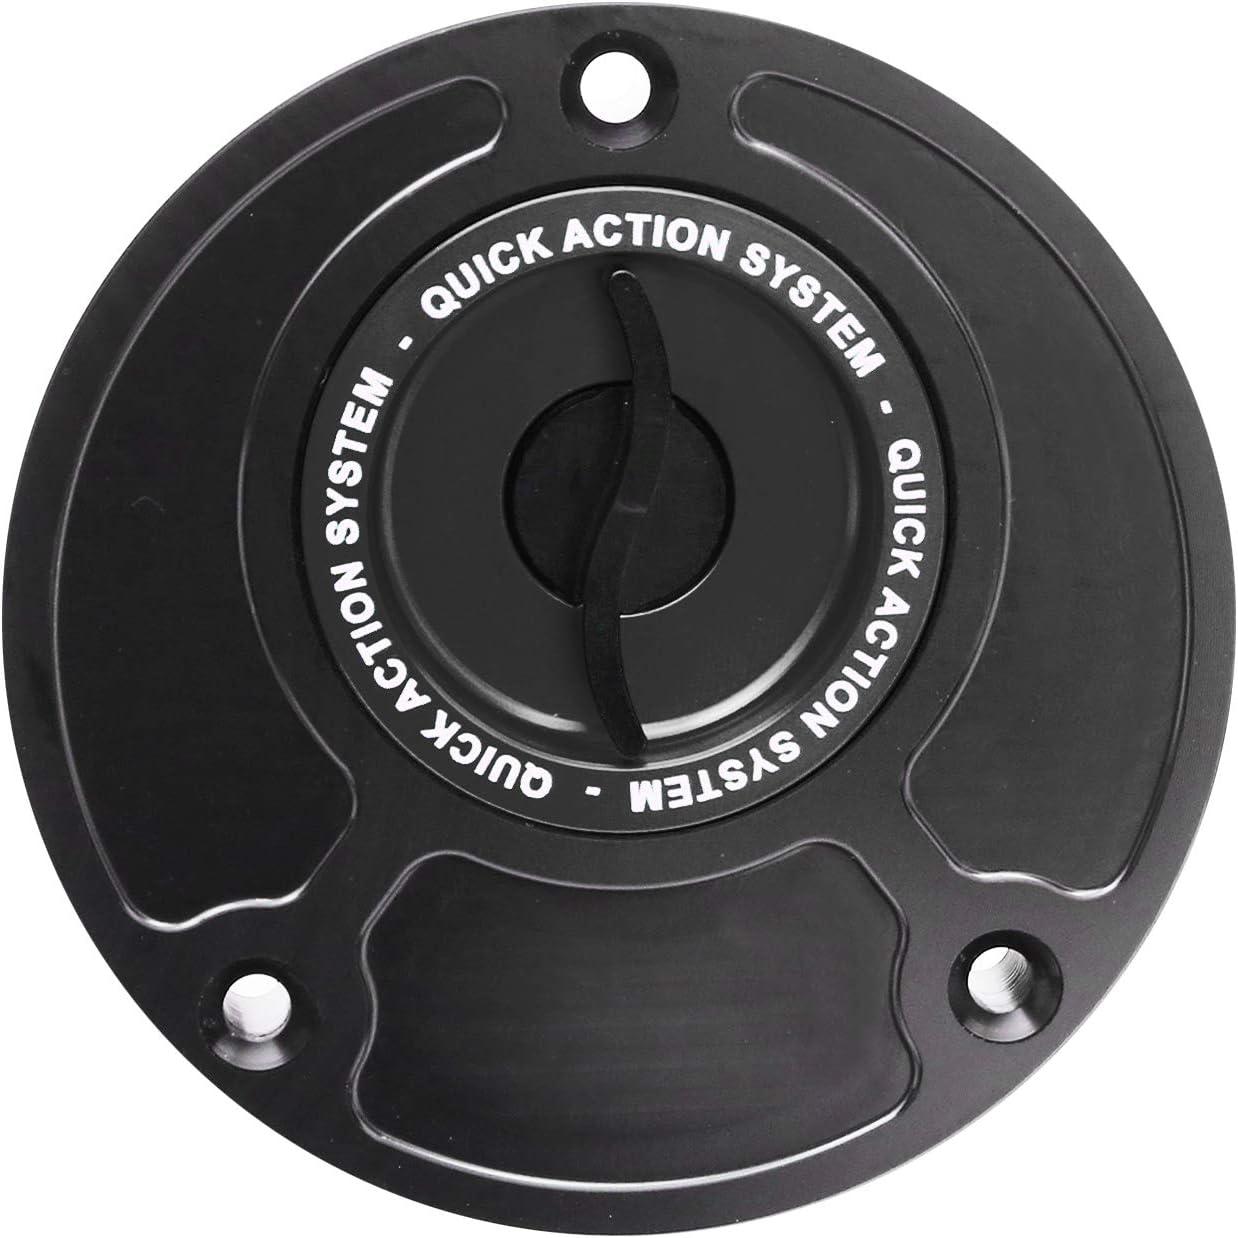 Black CNC Quick Lock Fuel Gas Cap For Kawasaki ZX 6RR 636 2003-2006 ZZR600 2005-2007 Ninja 650R 2006-2007